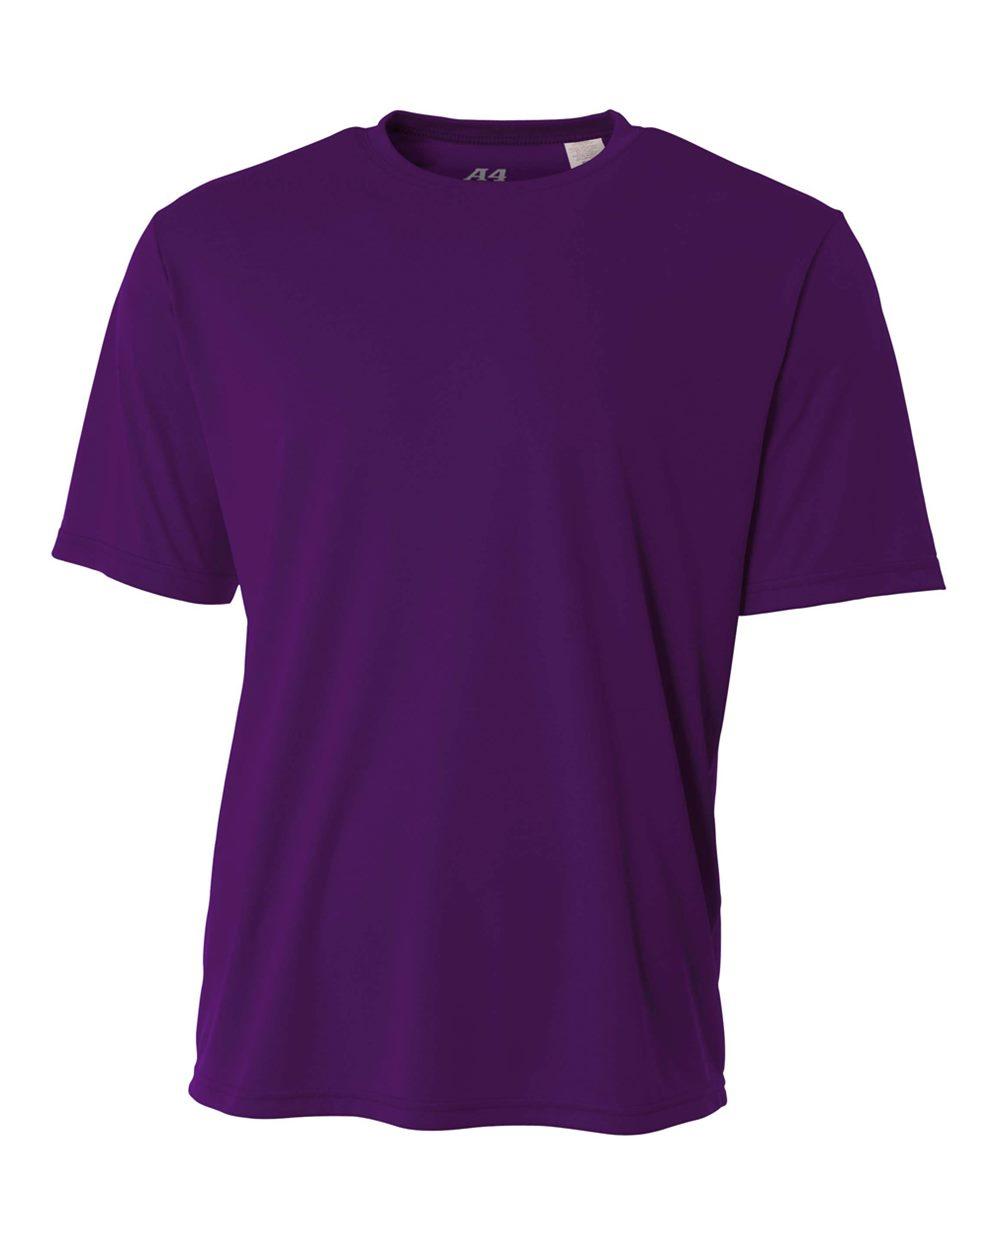 mw-polo-purple.jpg